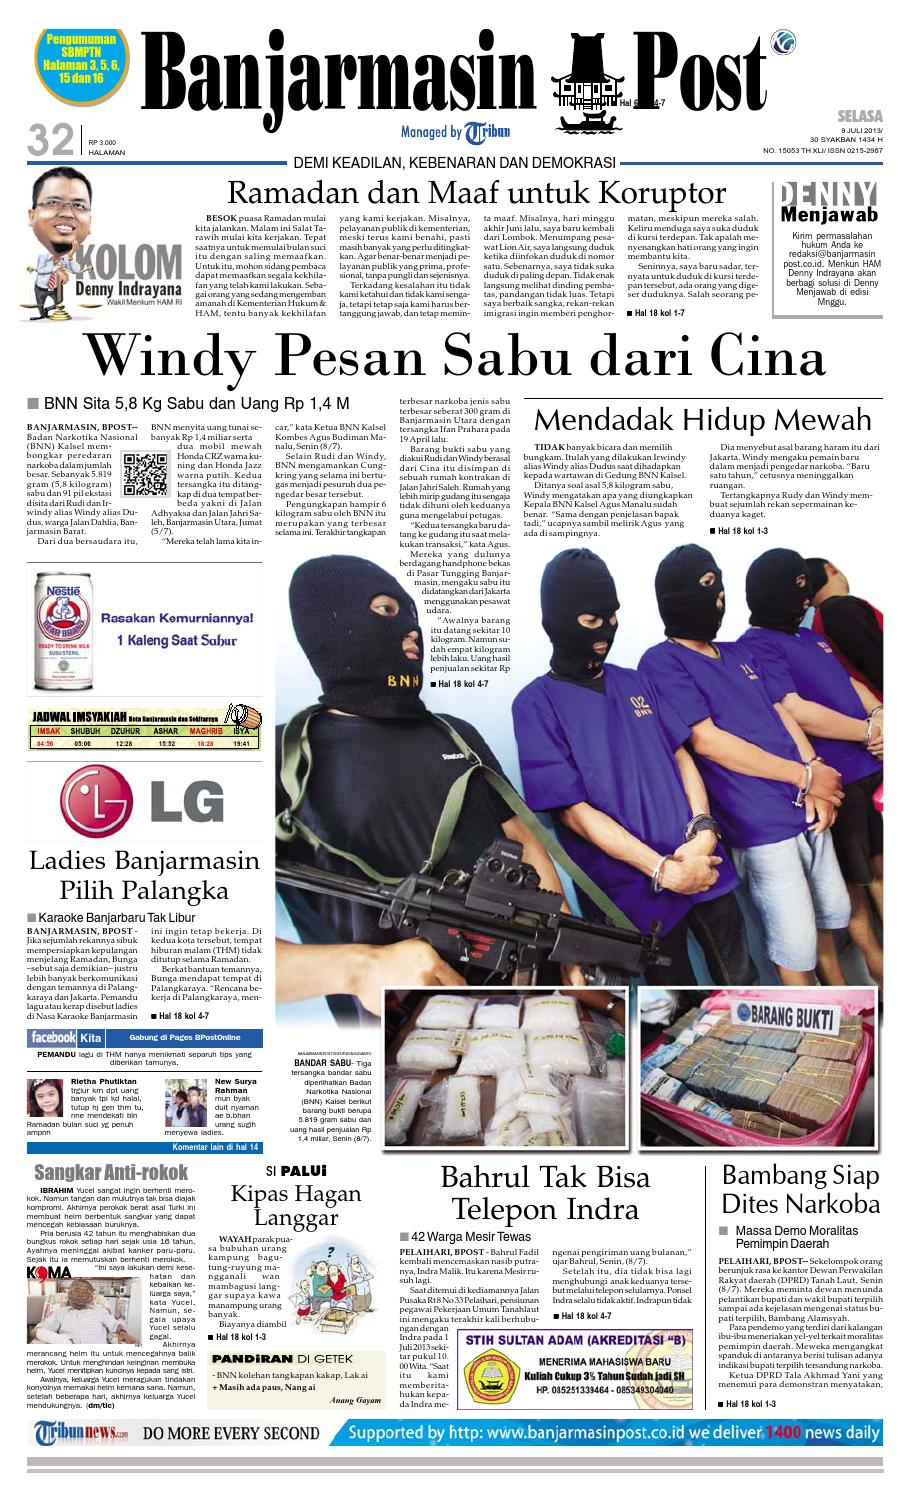 Banjarmasin Post Selasa 9 Juli 2013 By Issuu Fcenter Lemari Pakaian Wd Hk 1802 Sh Jawa Tengah